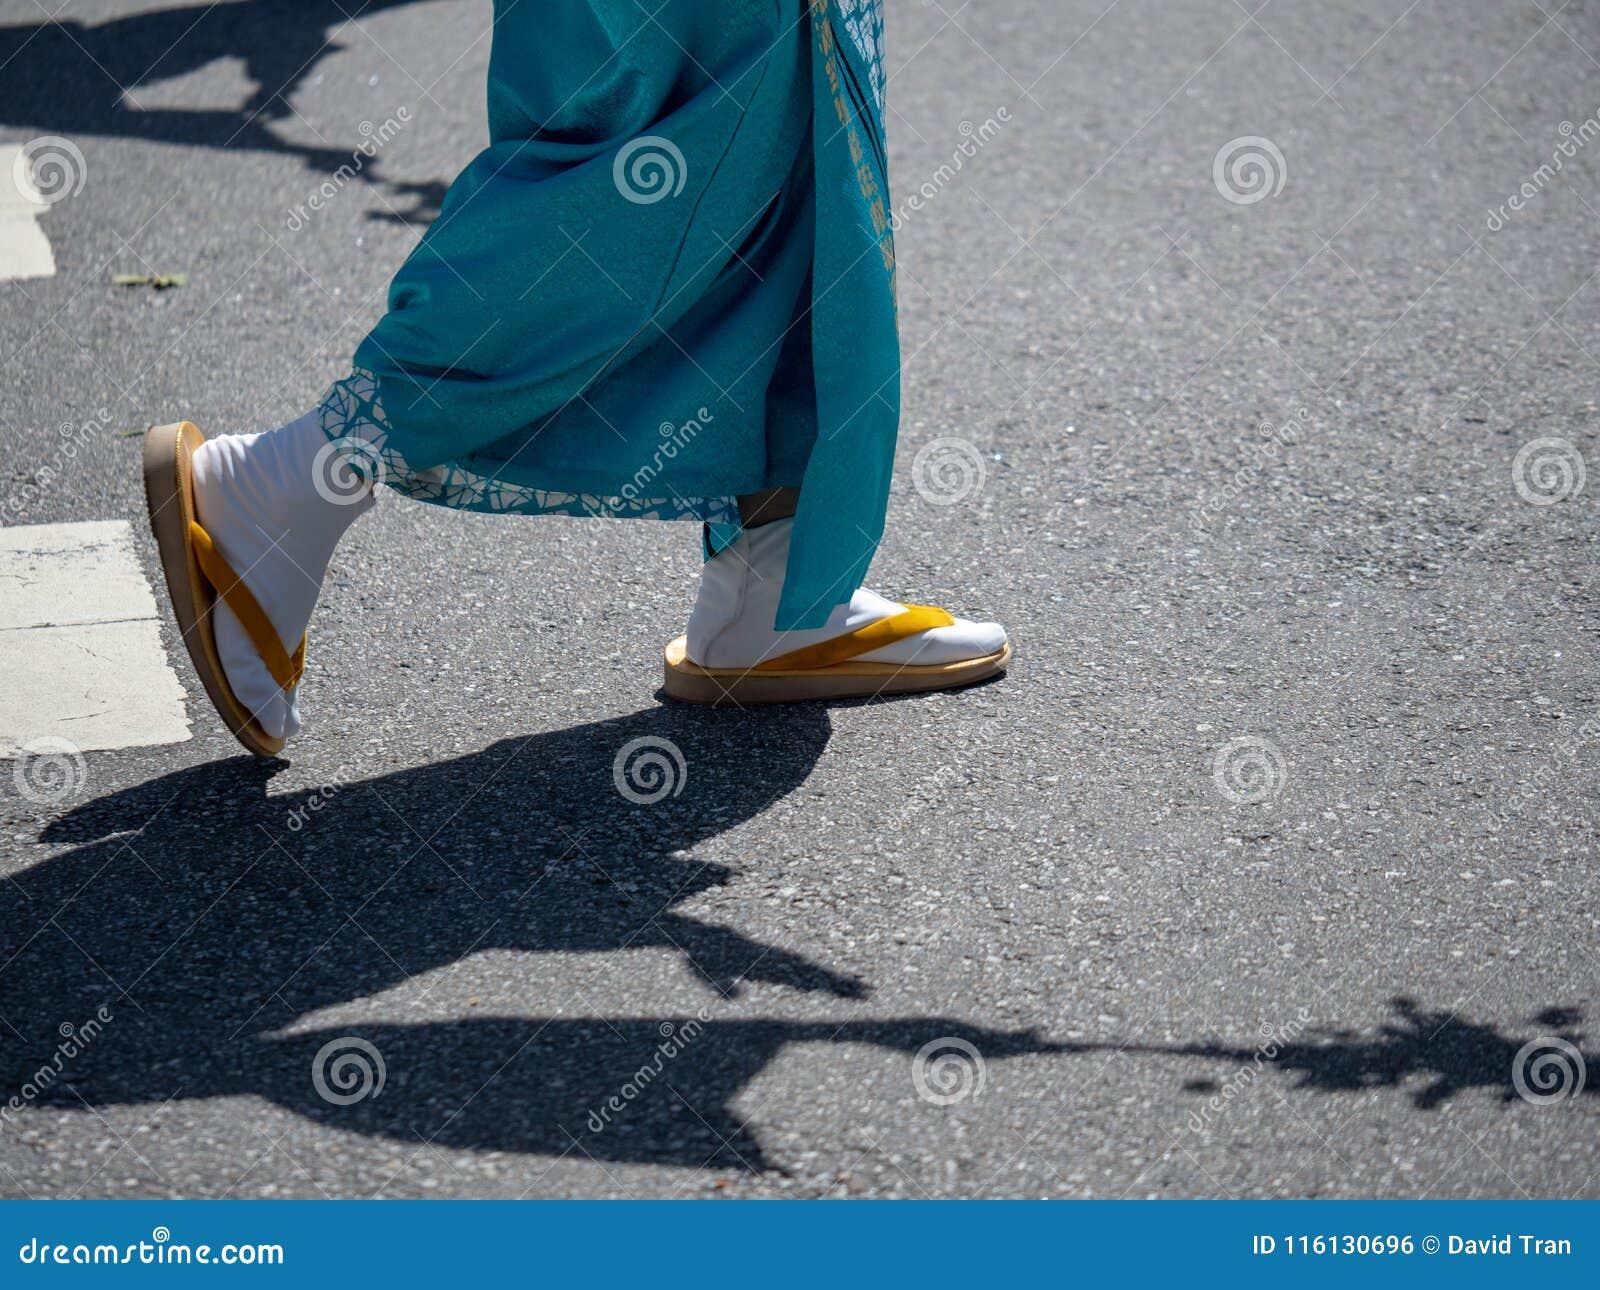 Donna Kimono Sandali Geta Geta Kimono Donna Kimono Sandali Sandali Geta Sandali Kimono Donna qMpGSzLUV